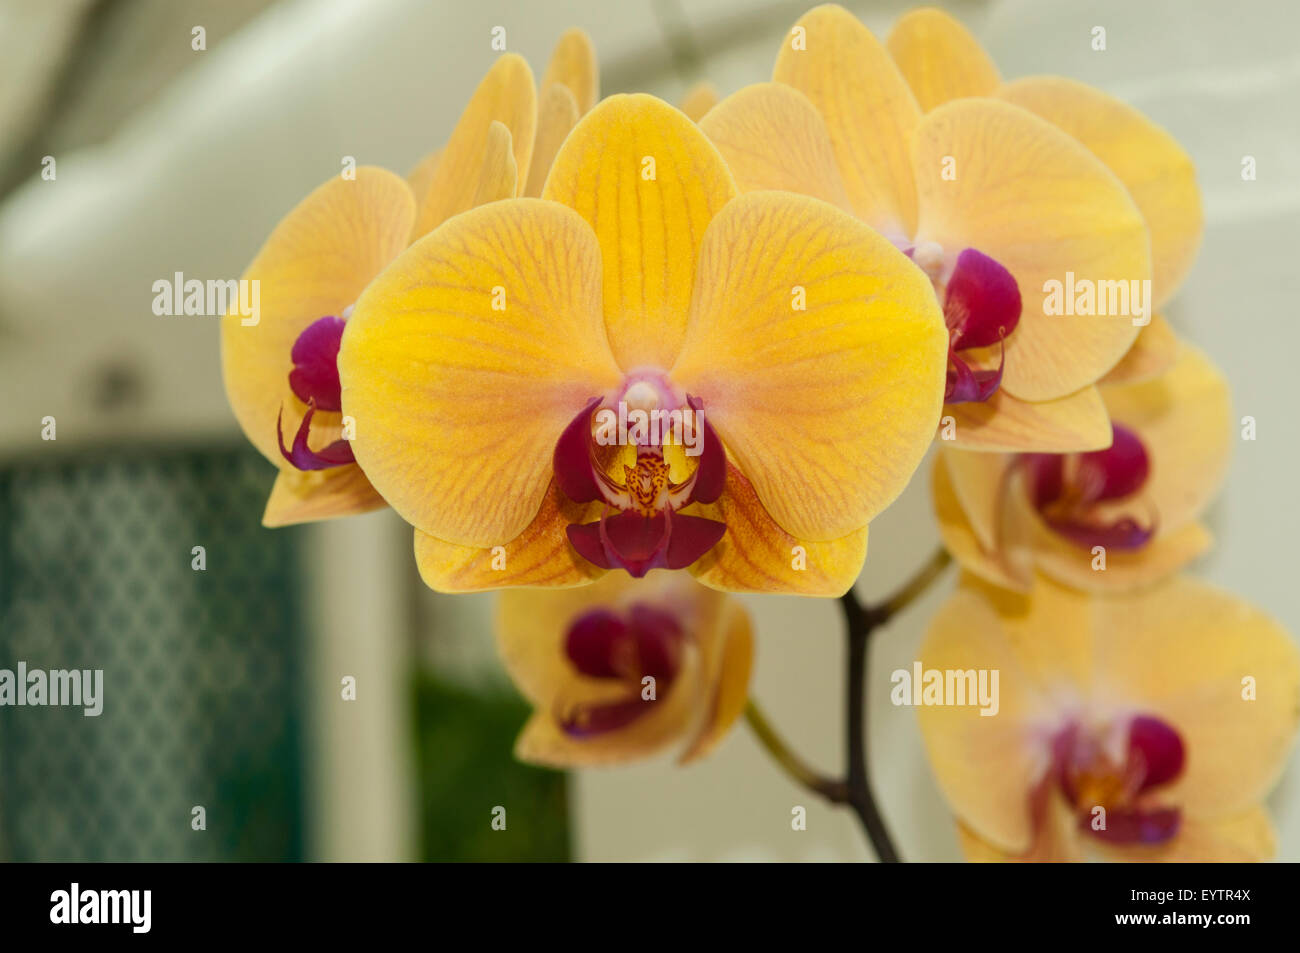 yellow phalaenopsis orchid stock photos yellow phalaenopsis orchid